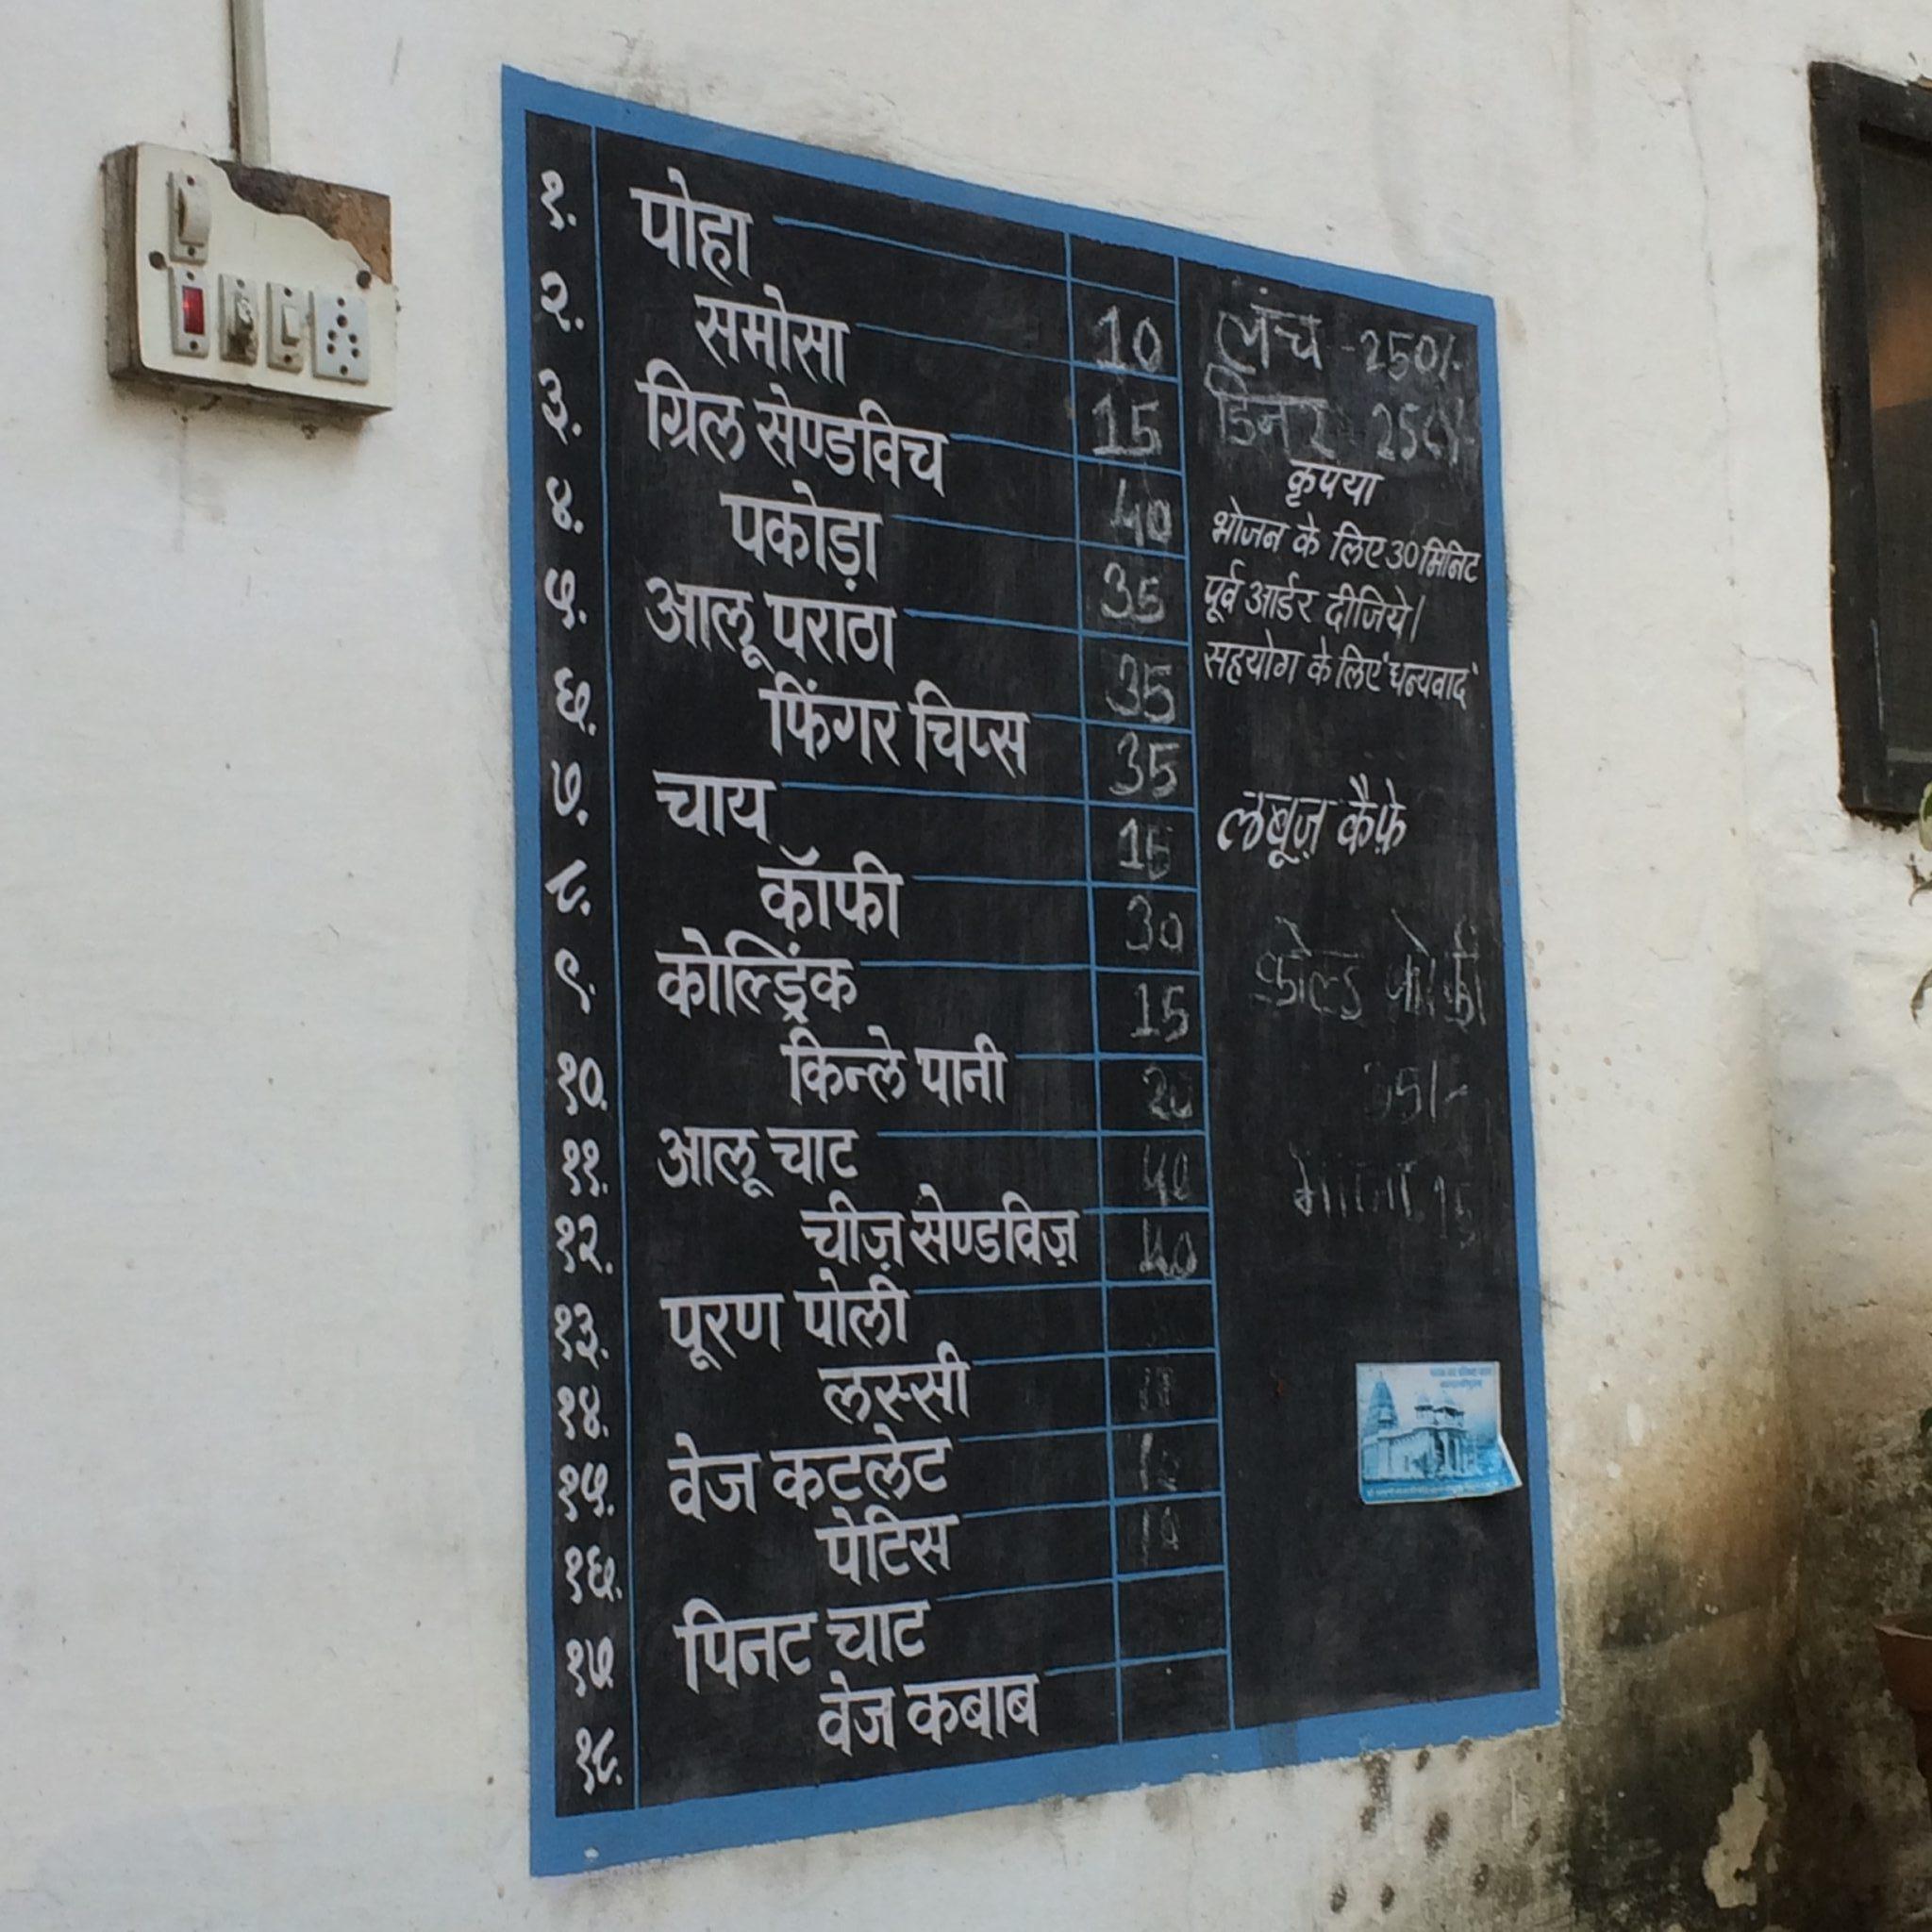 Labbooz Cafe outside Ahilya Fort